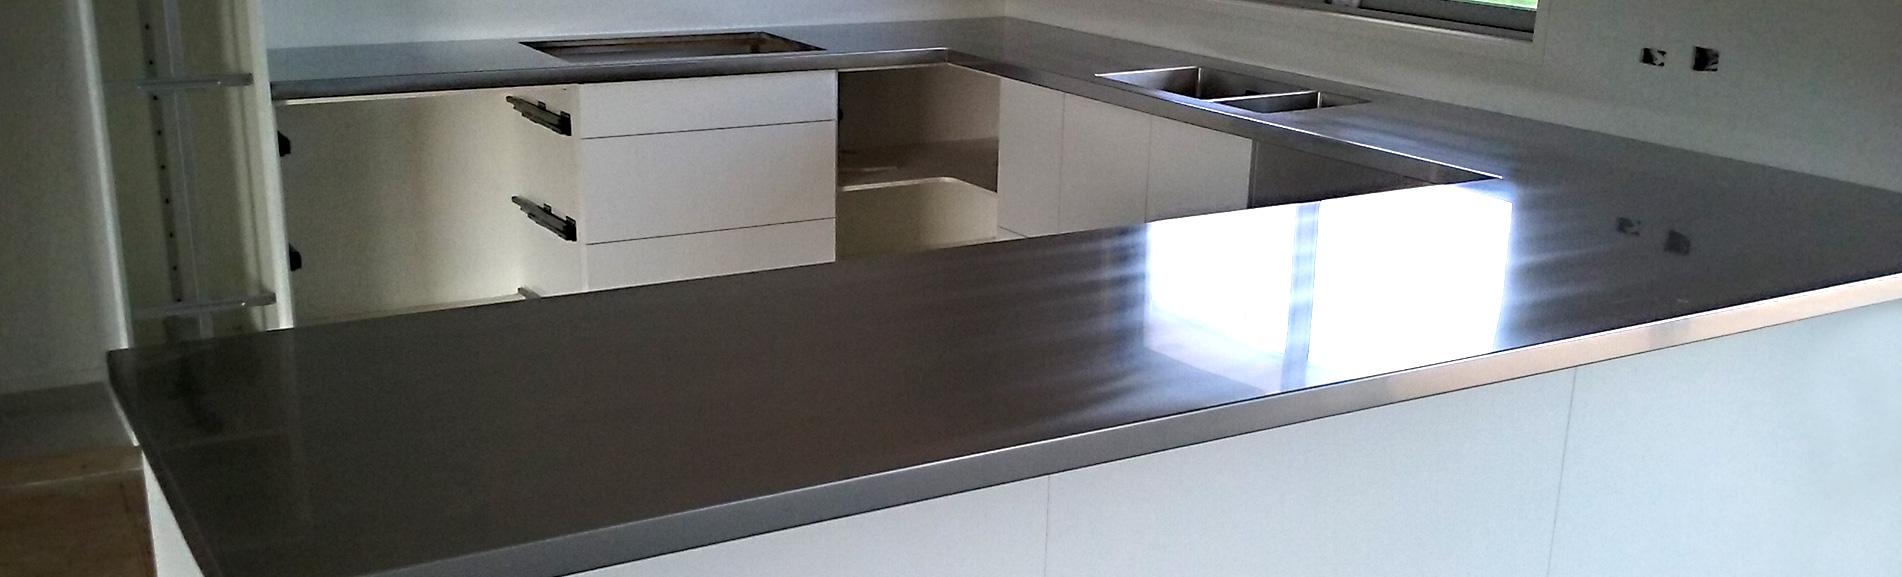 Large U shaped kitchen bench